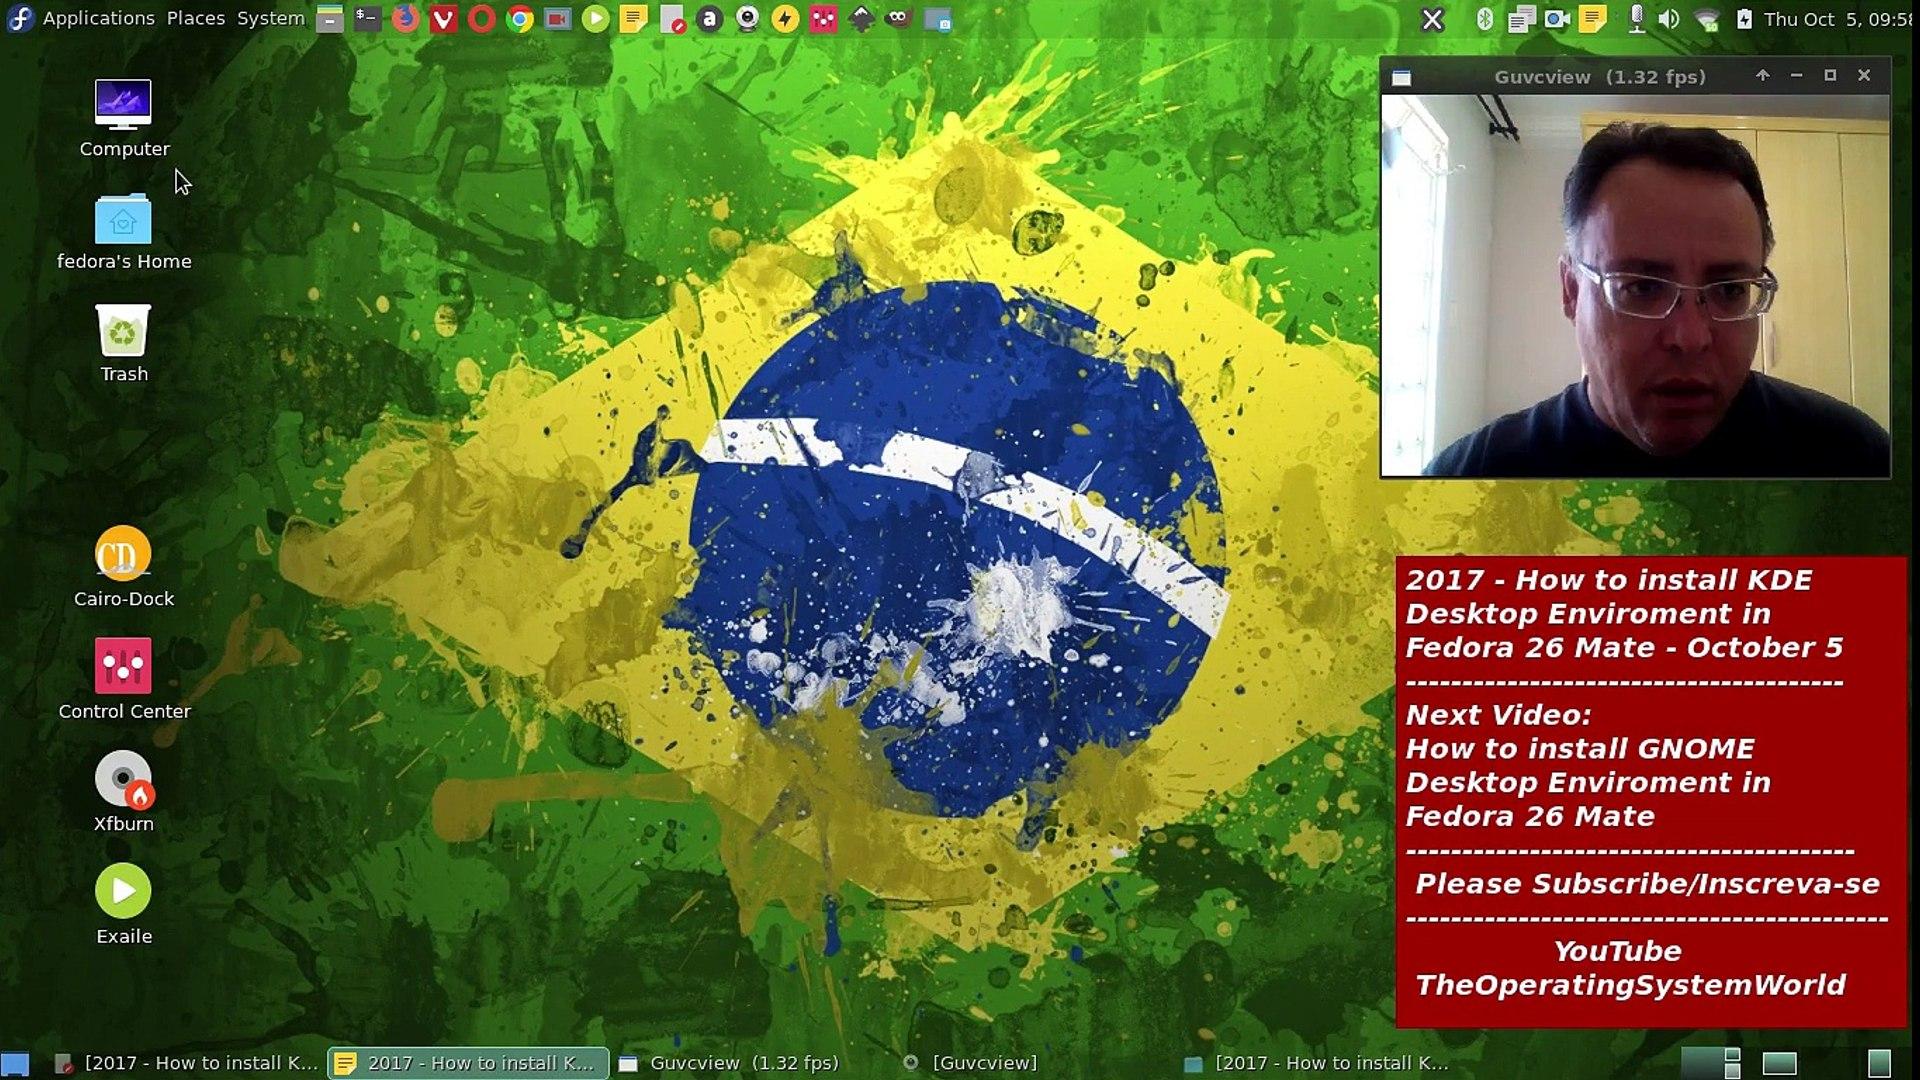 2017 - How to install KDE Desktop Enviroment on Fedora 26 Mate - October 5